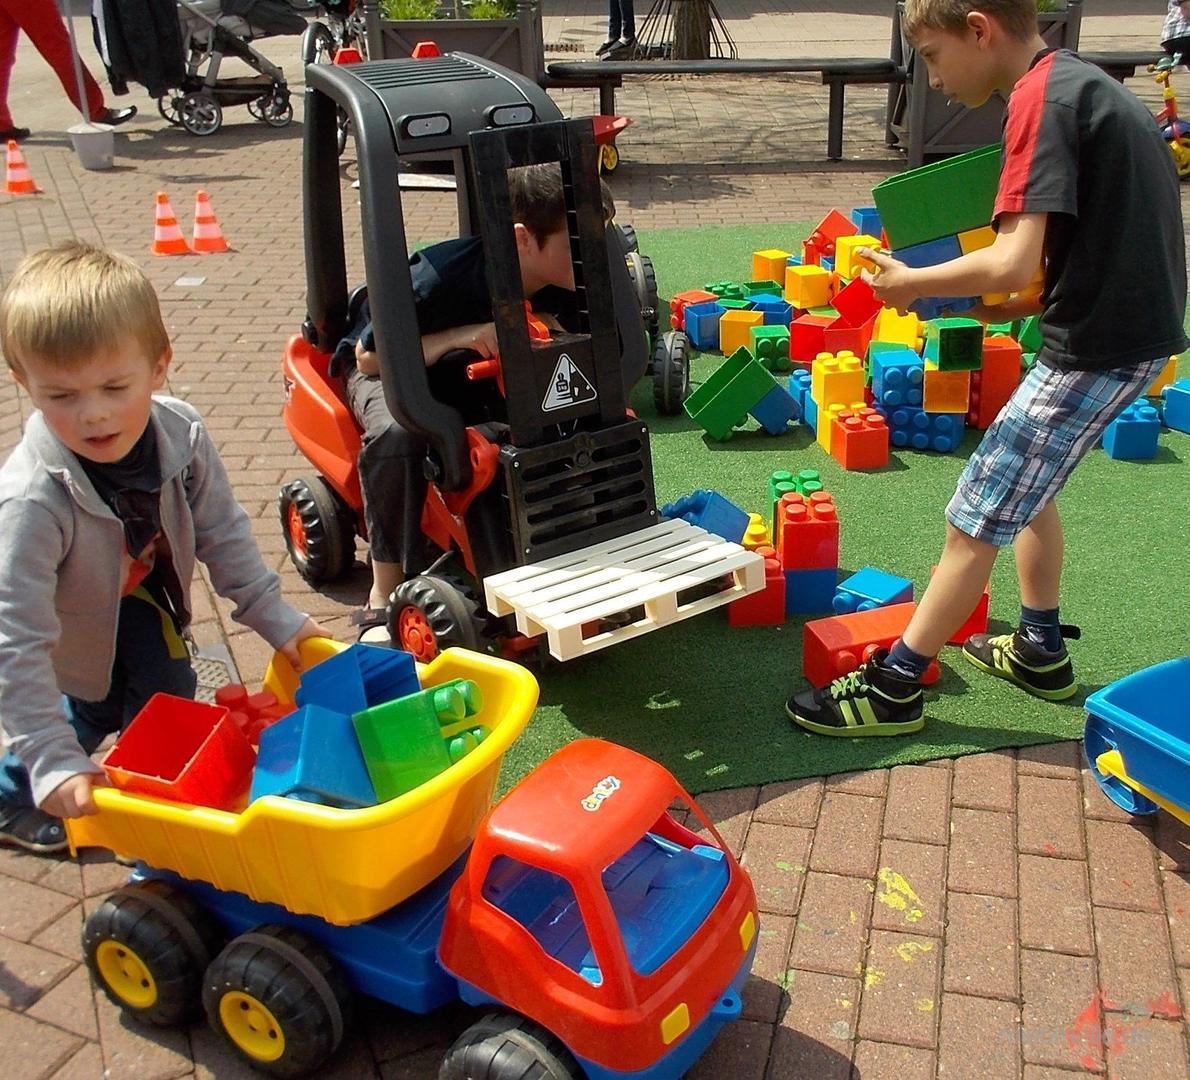 Basteln & Malen mieten & vermieten - Kinderbaustelle in Püttlingen